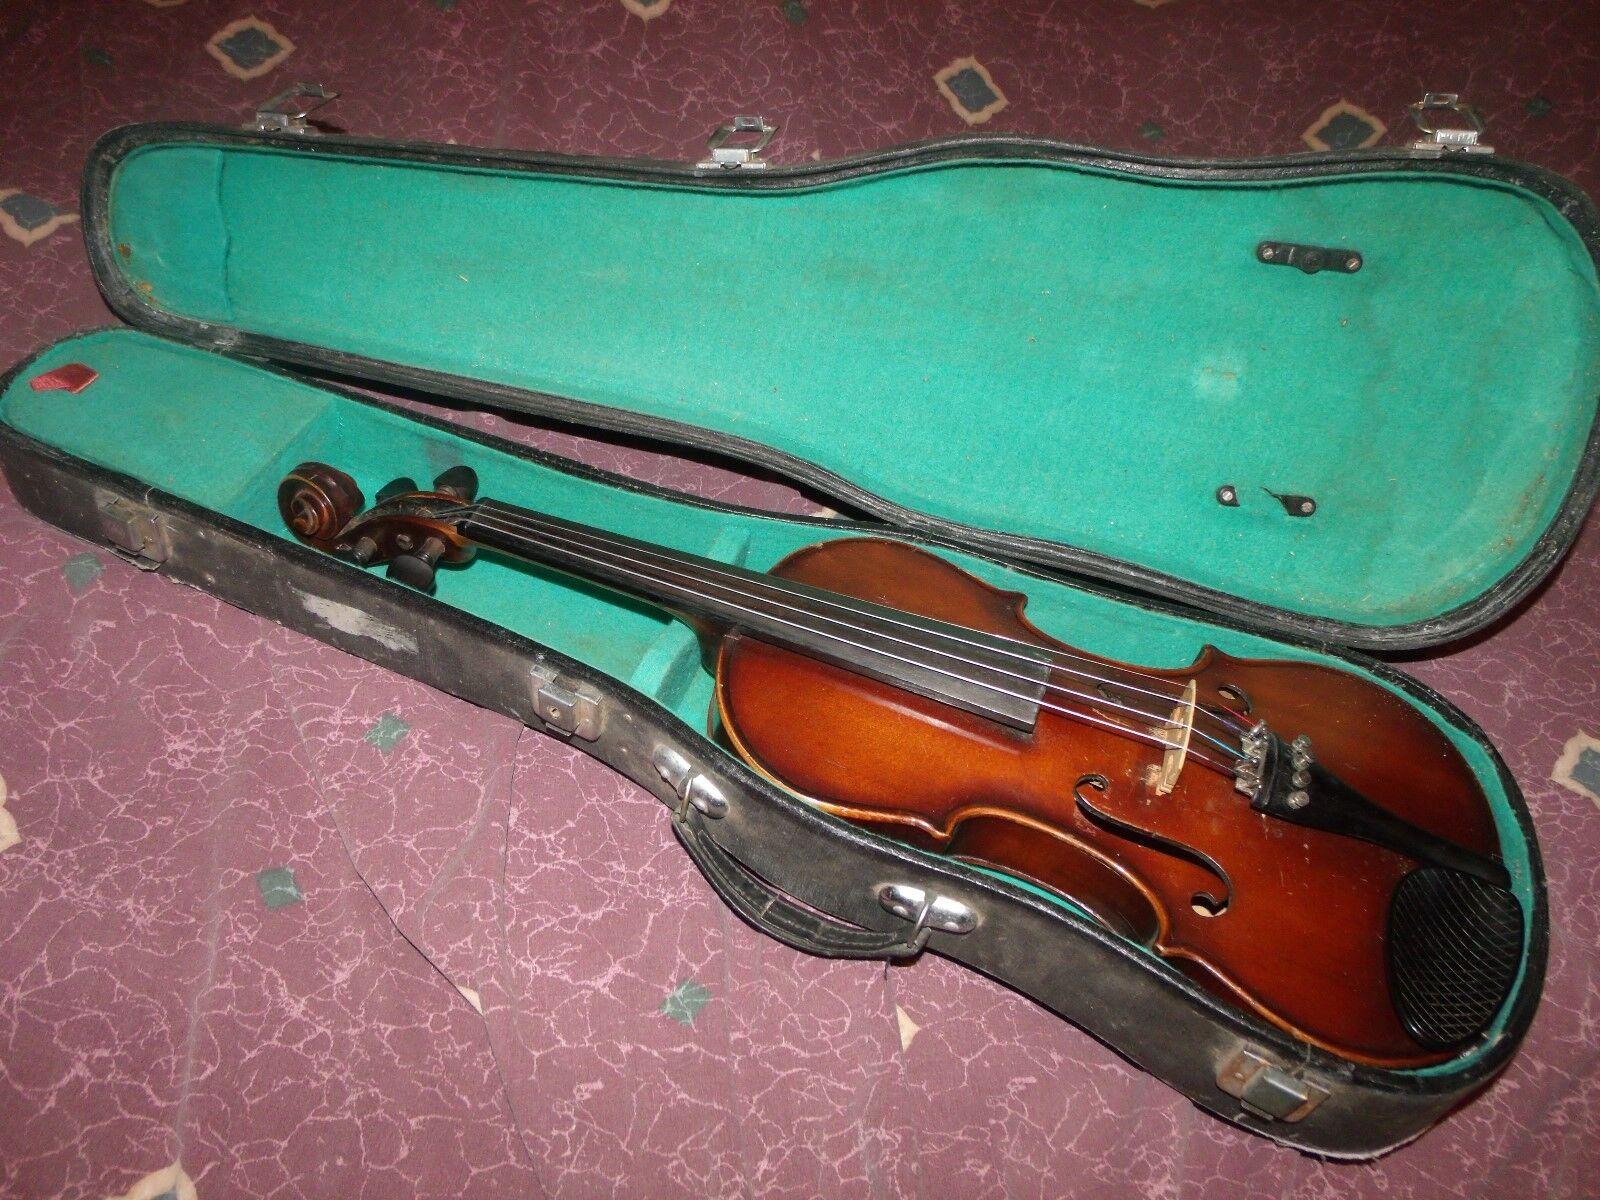 Ca 1920's Pan-American Symphony Model 4 4 Violin Elkhart Conn Germany Excellent